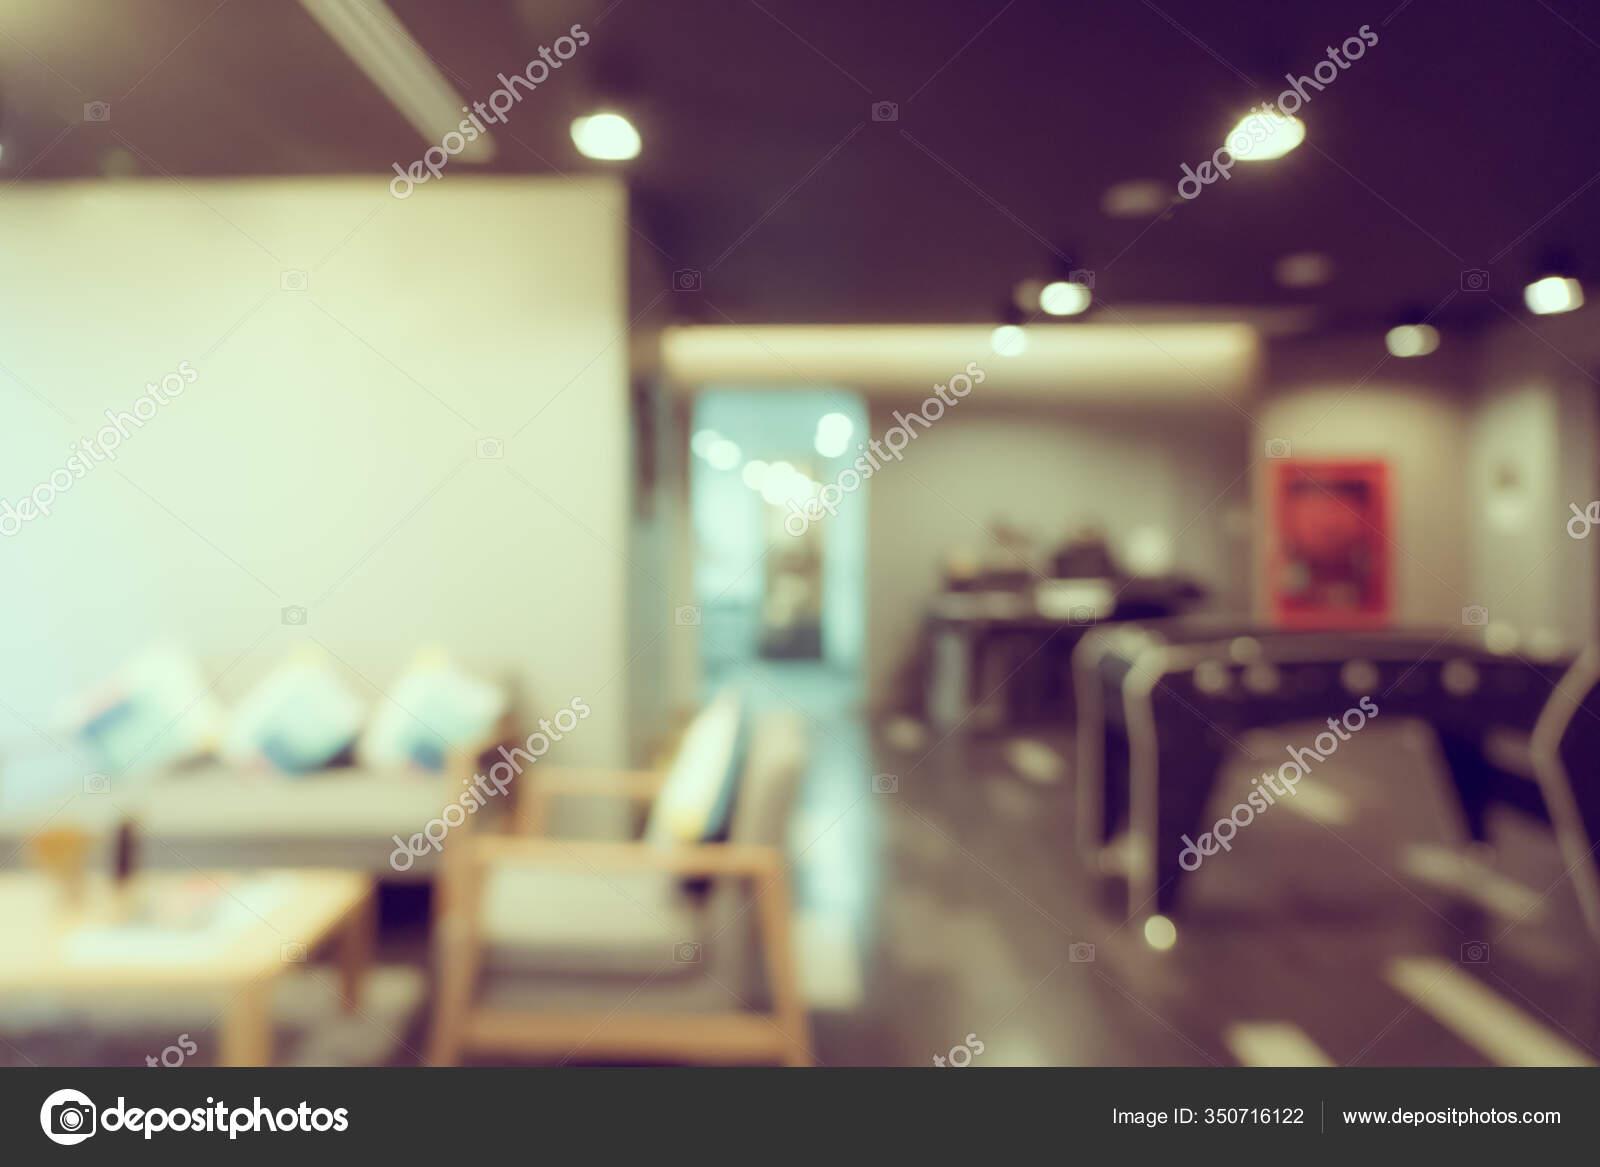 Abstract Blur Defocus Coffee Shop Cafe Restaurant Interior Background Stock Photo C Mrsiraphol 350716122